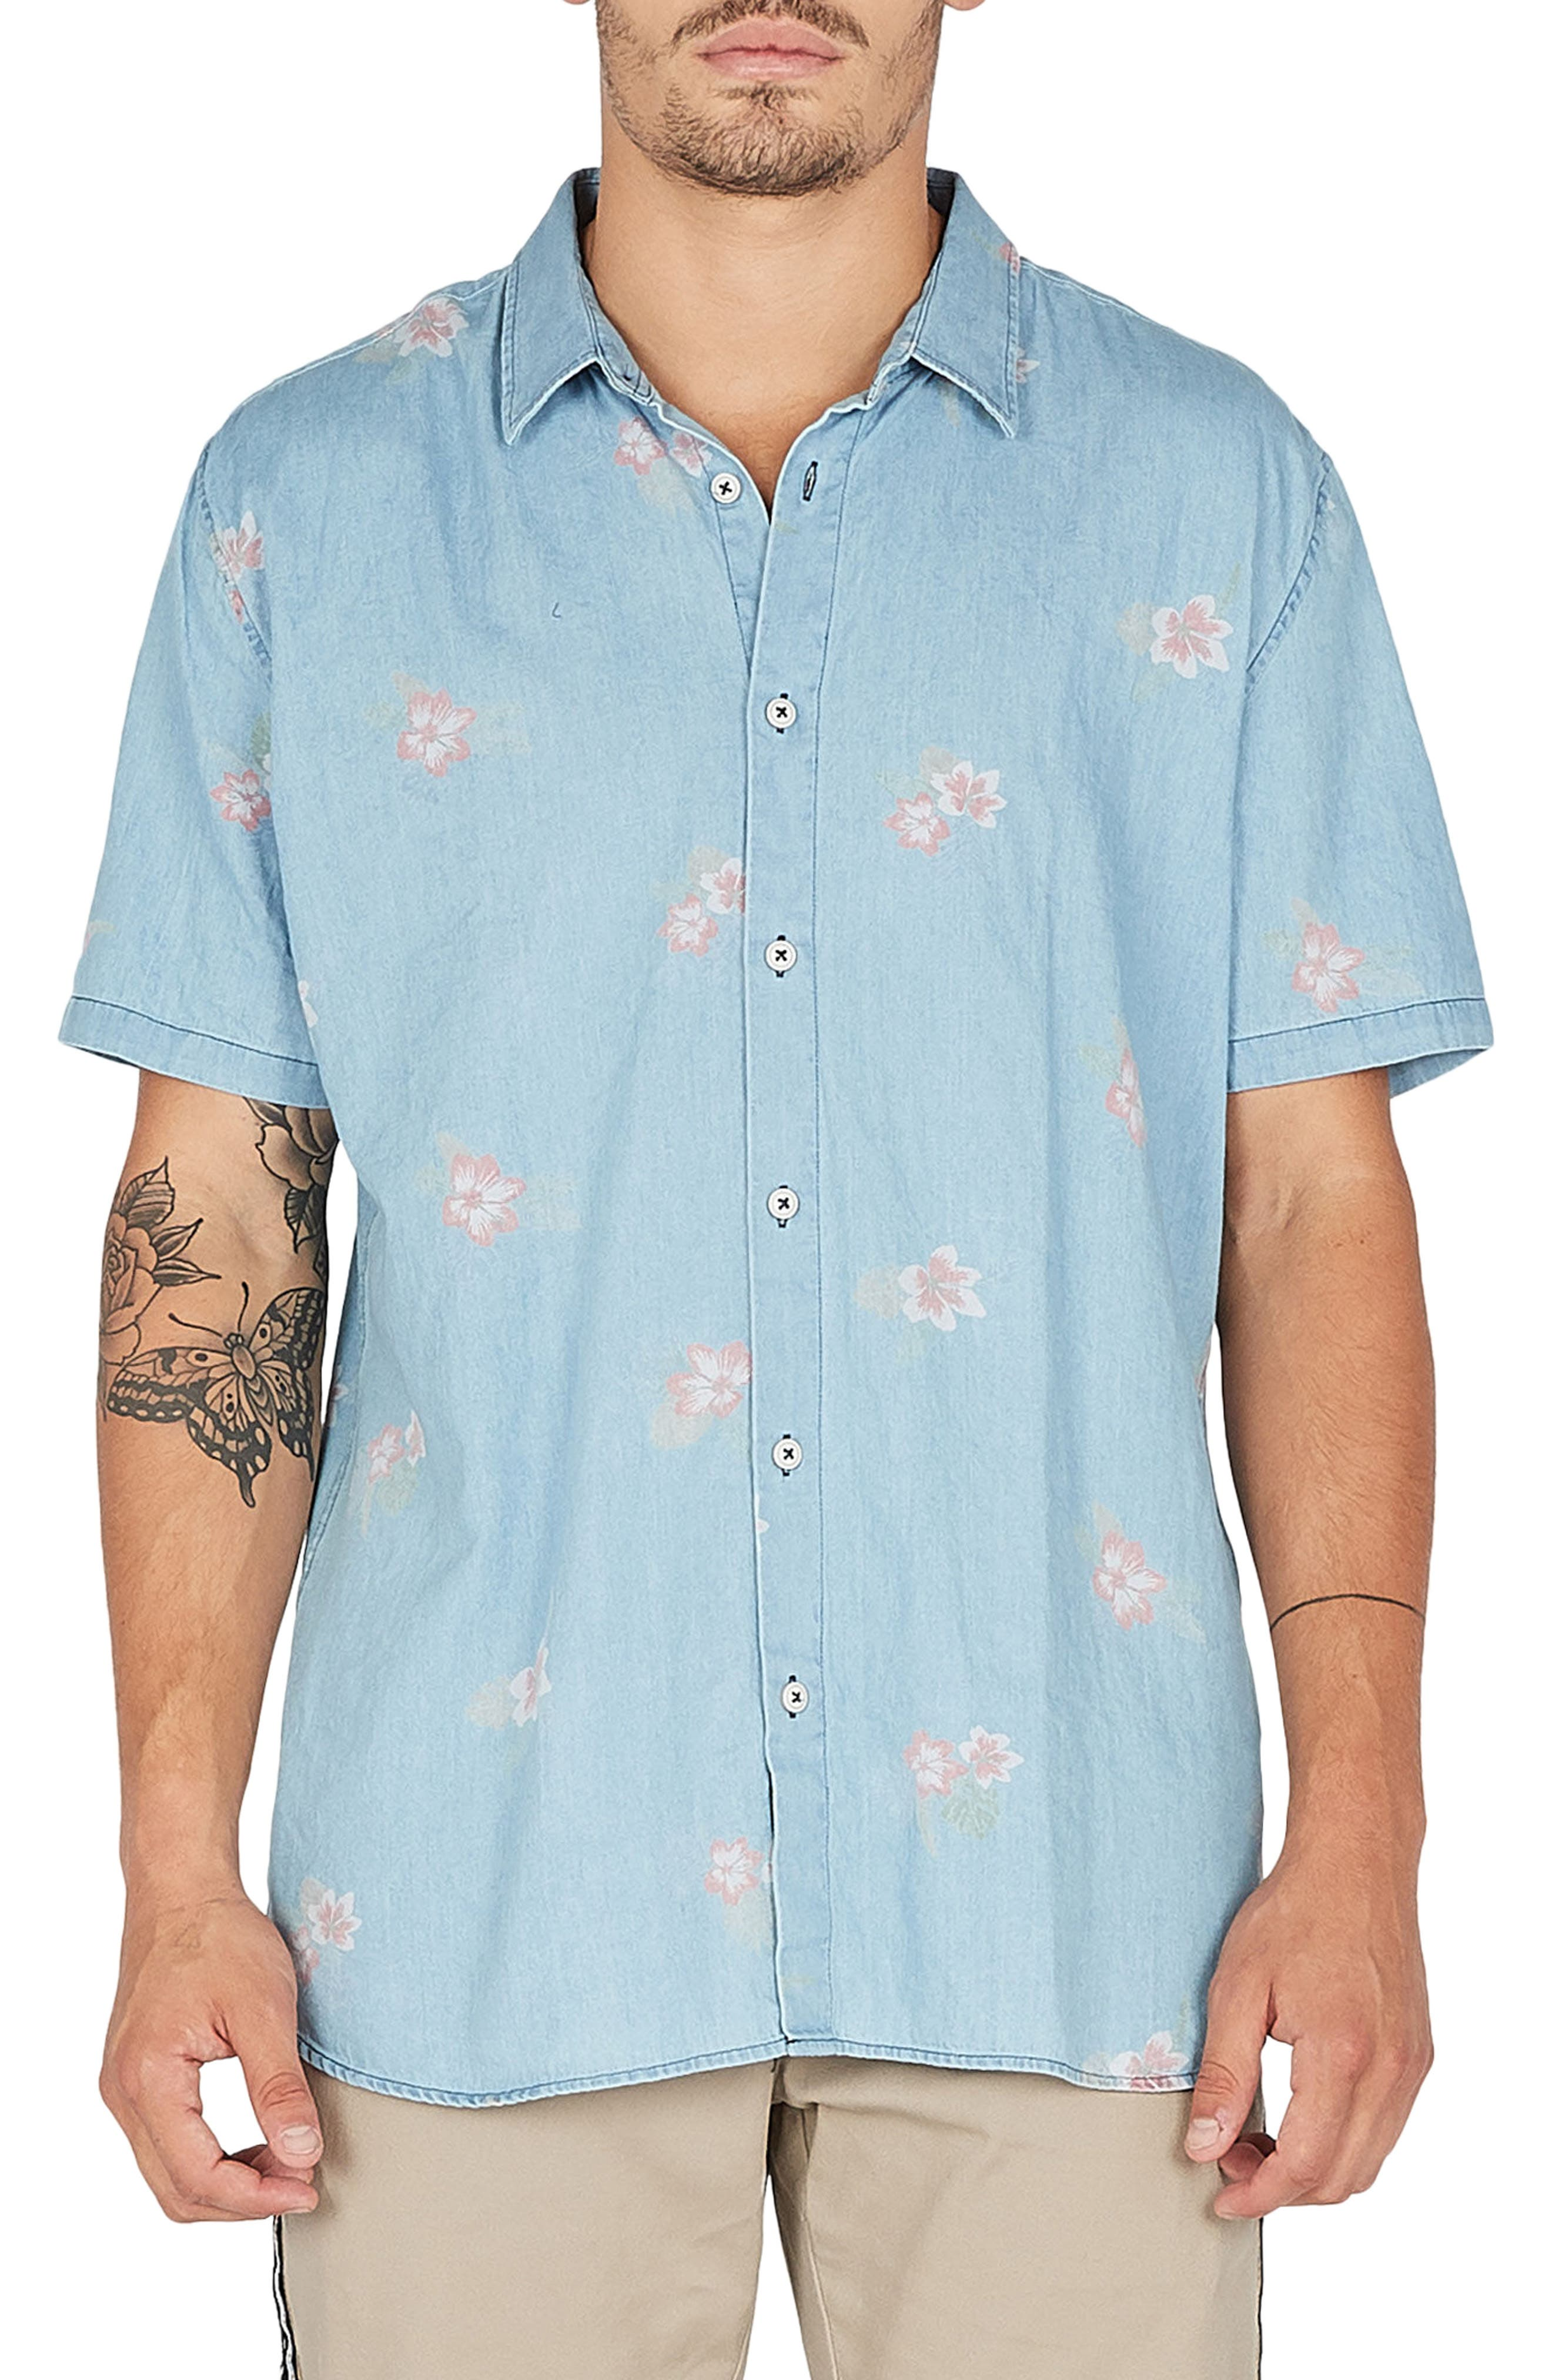 Holiday Woven Shirt,                         Main,                         color, Indigo/ Floral